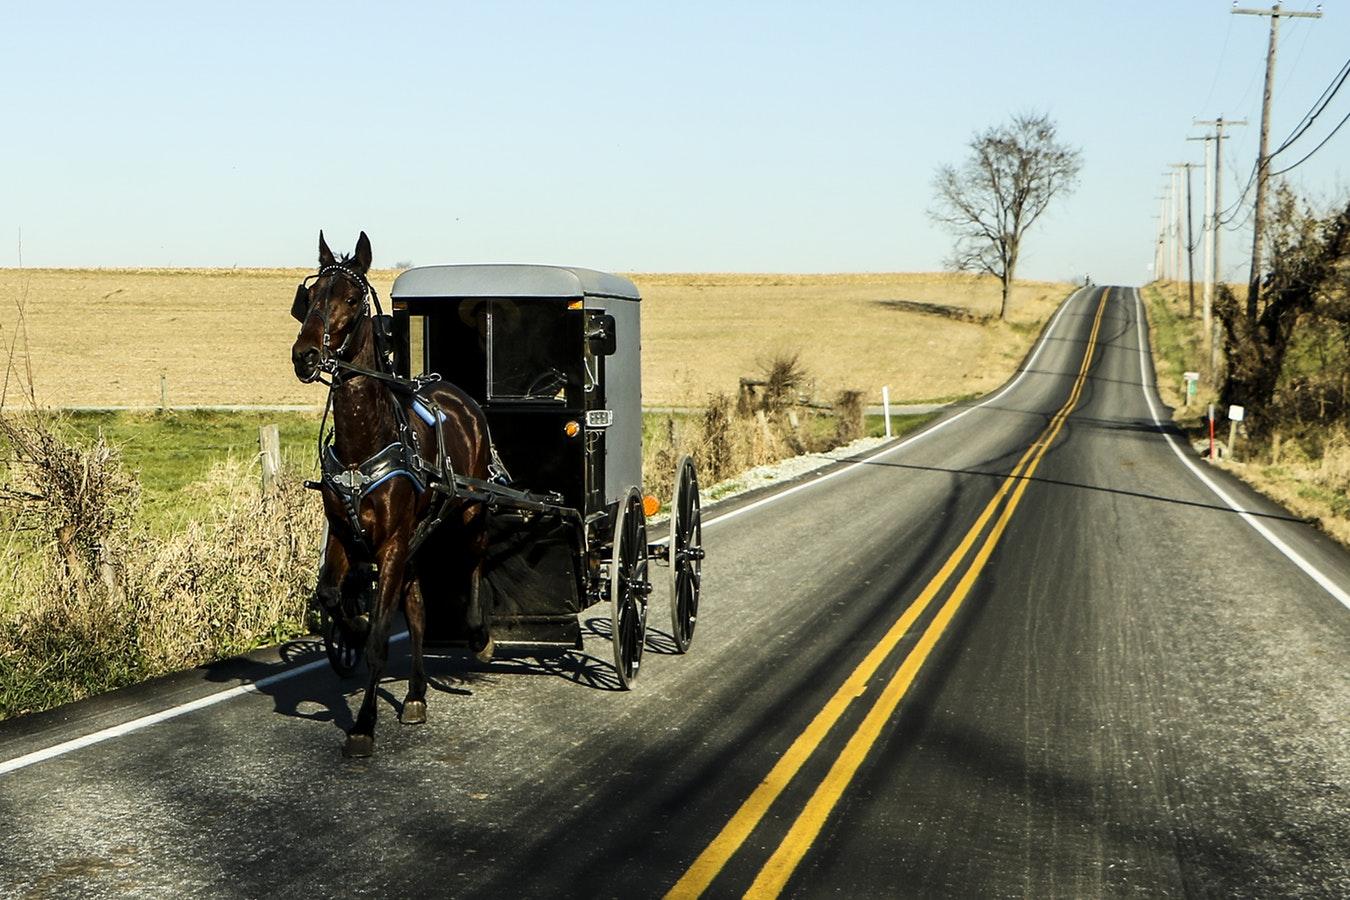 horse leading black caraige.